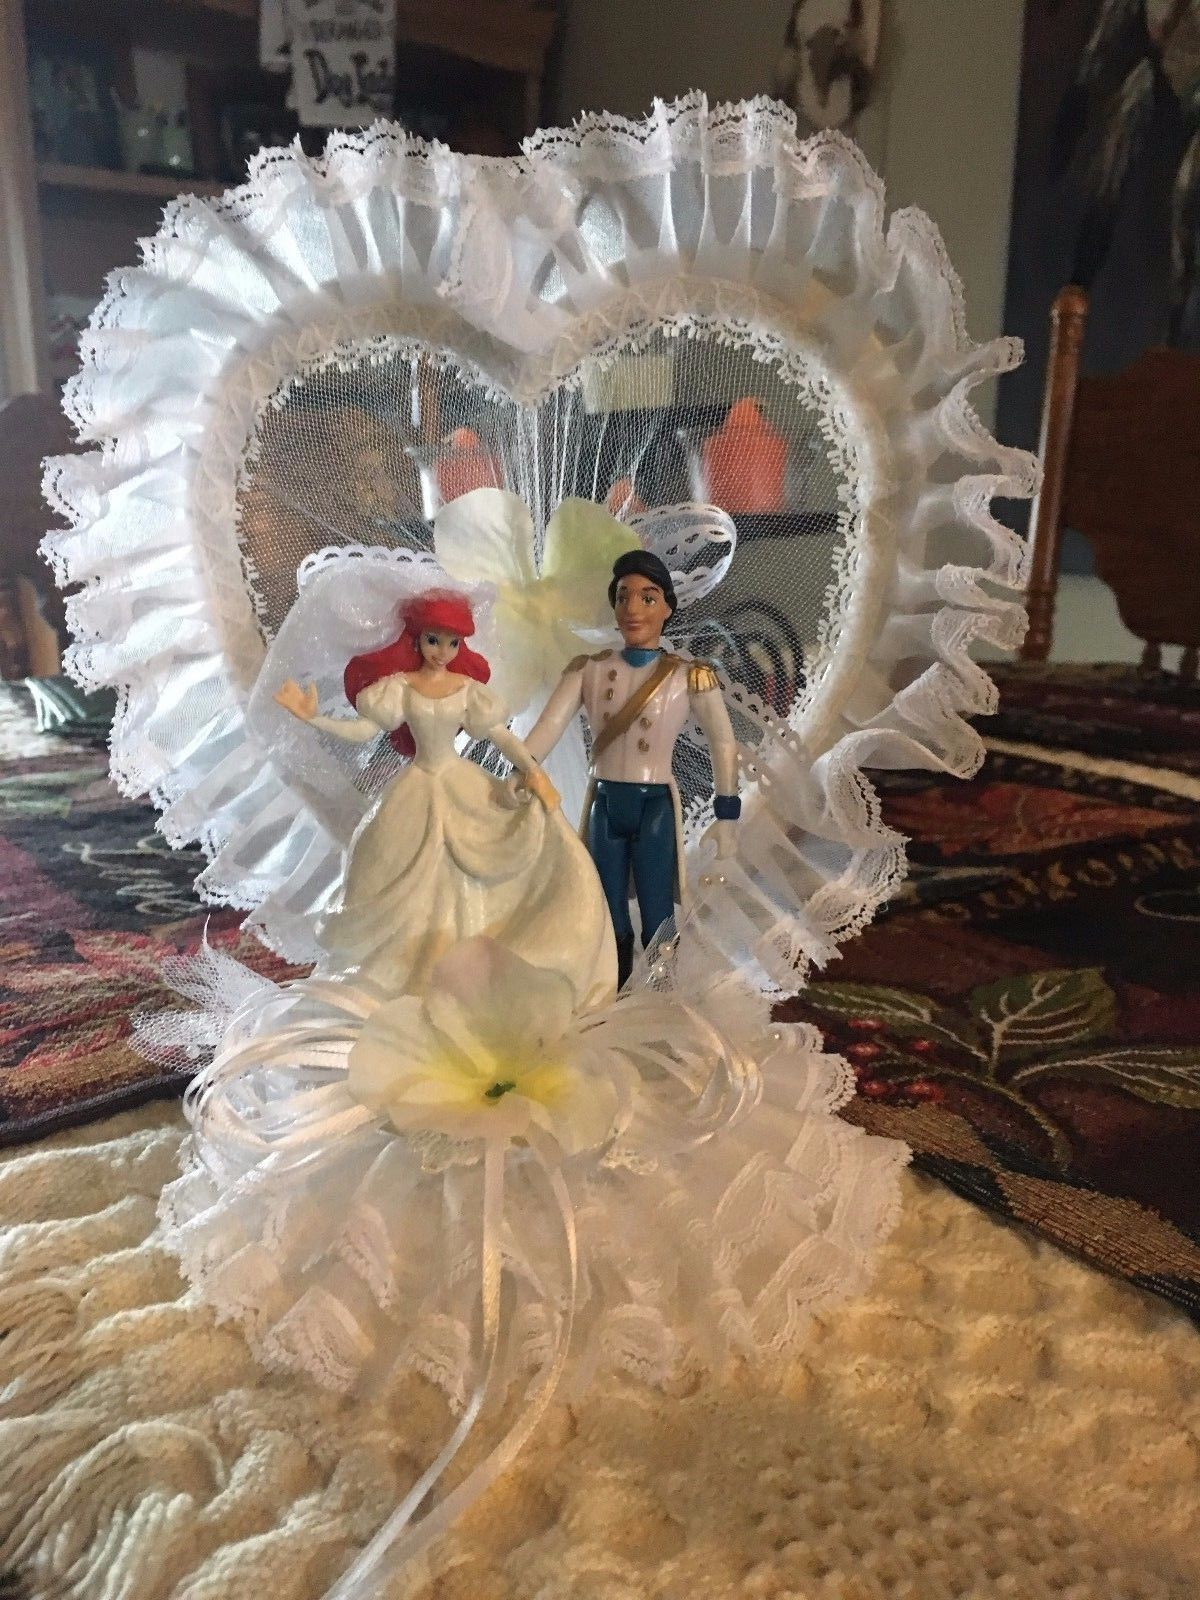 Mermaid Cake Toppers - Shop Mermaid Cake Toppers Online